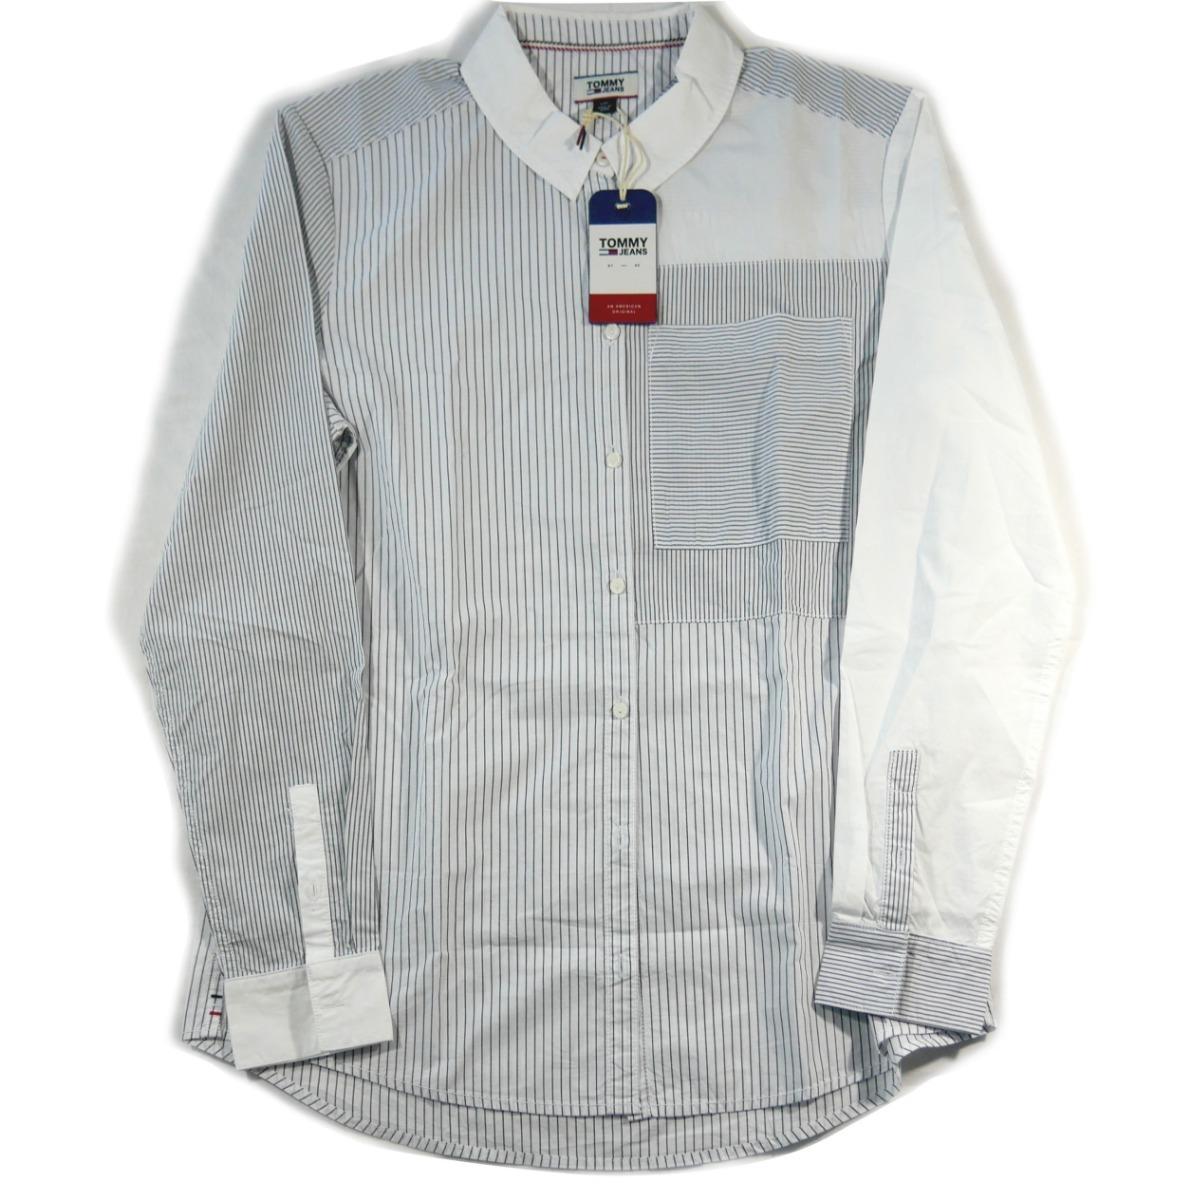 e3cf7ed81a6 camisas para caballero tommy hilfiger 100% original talla l. Cargando zoom.